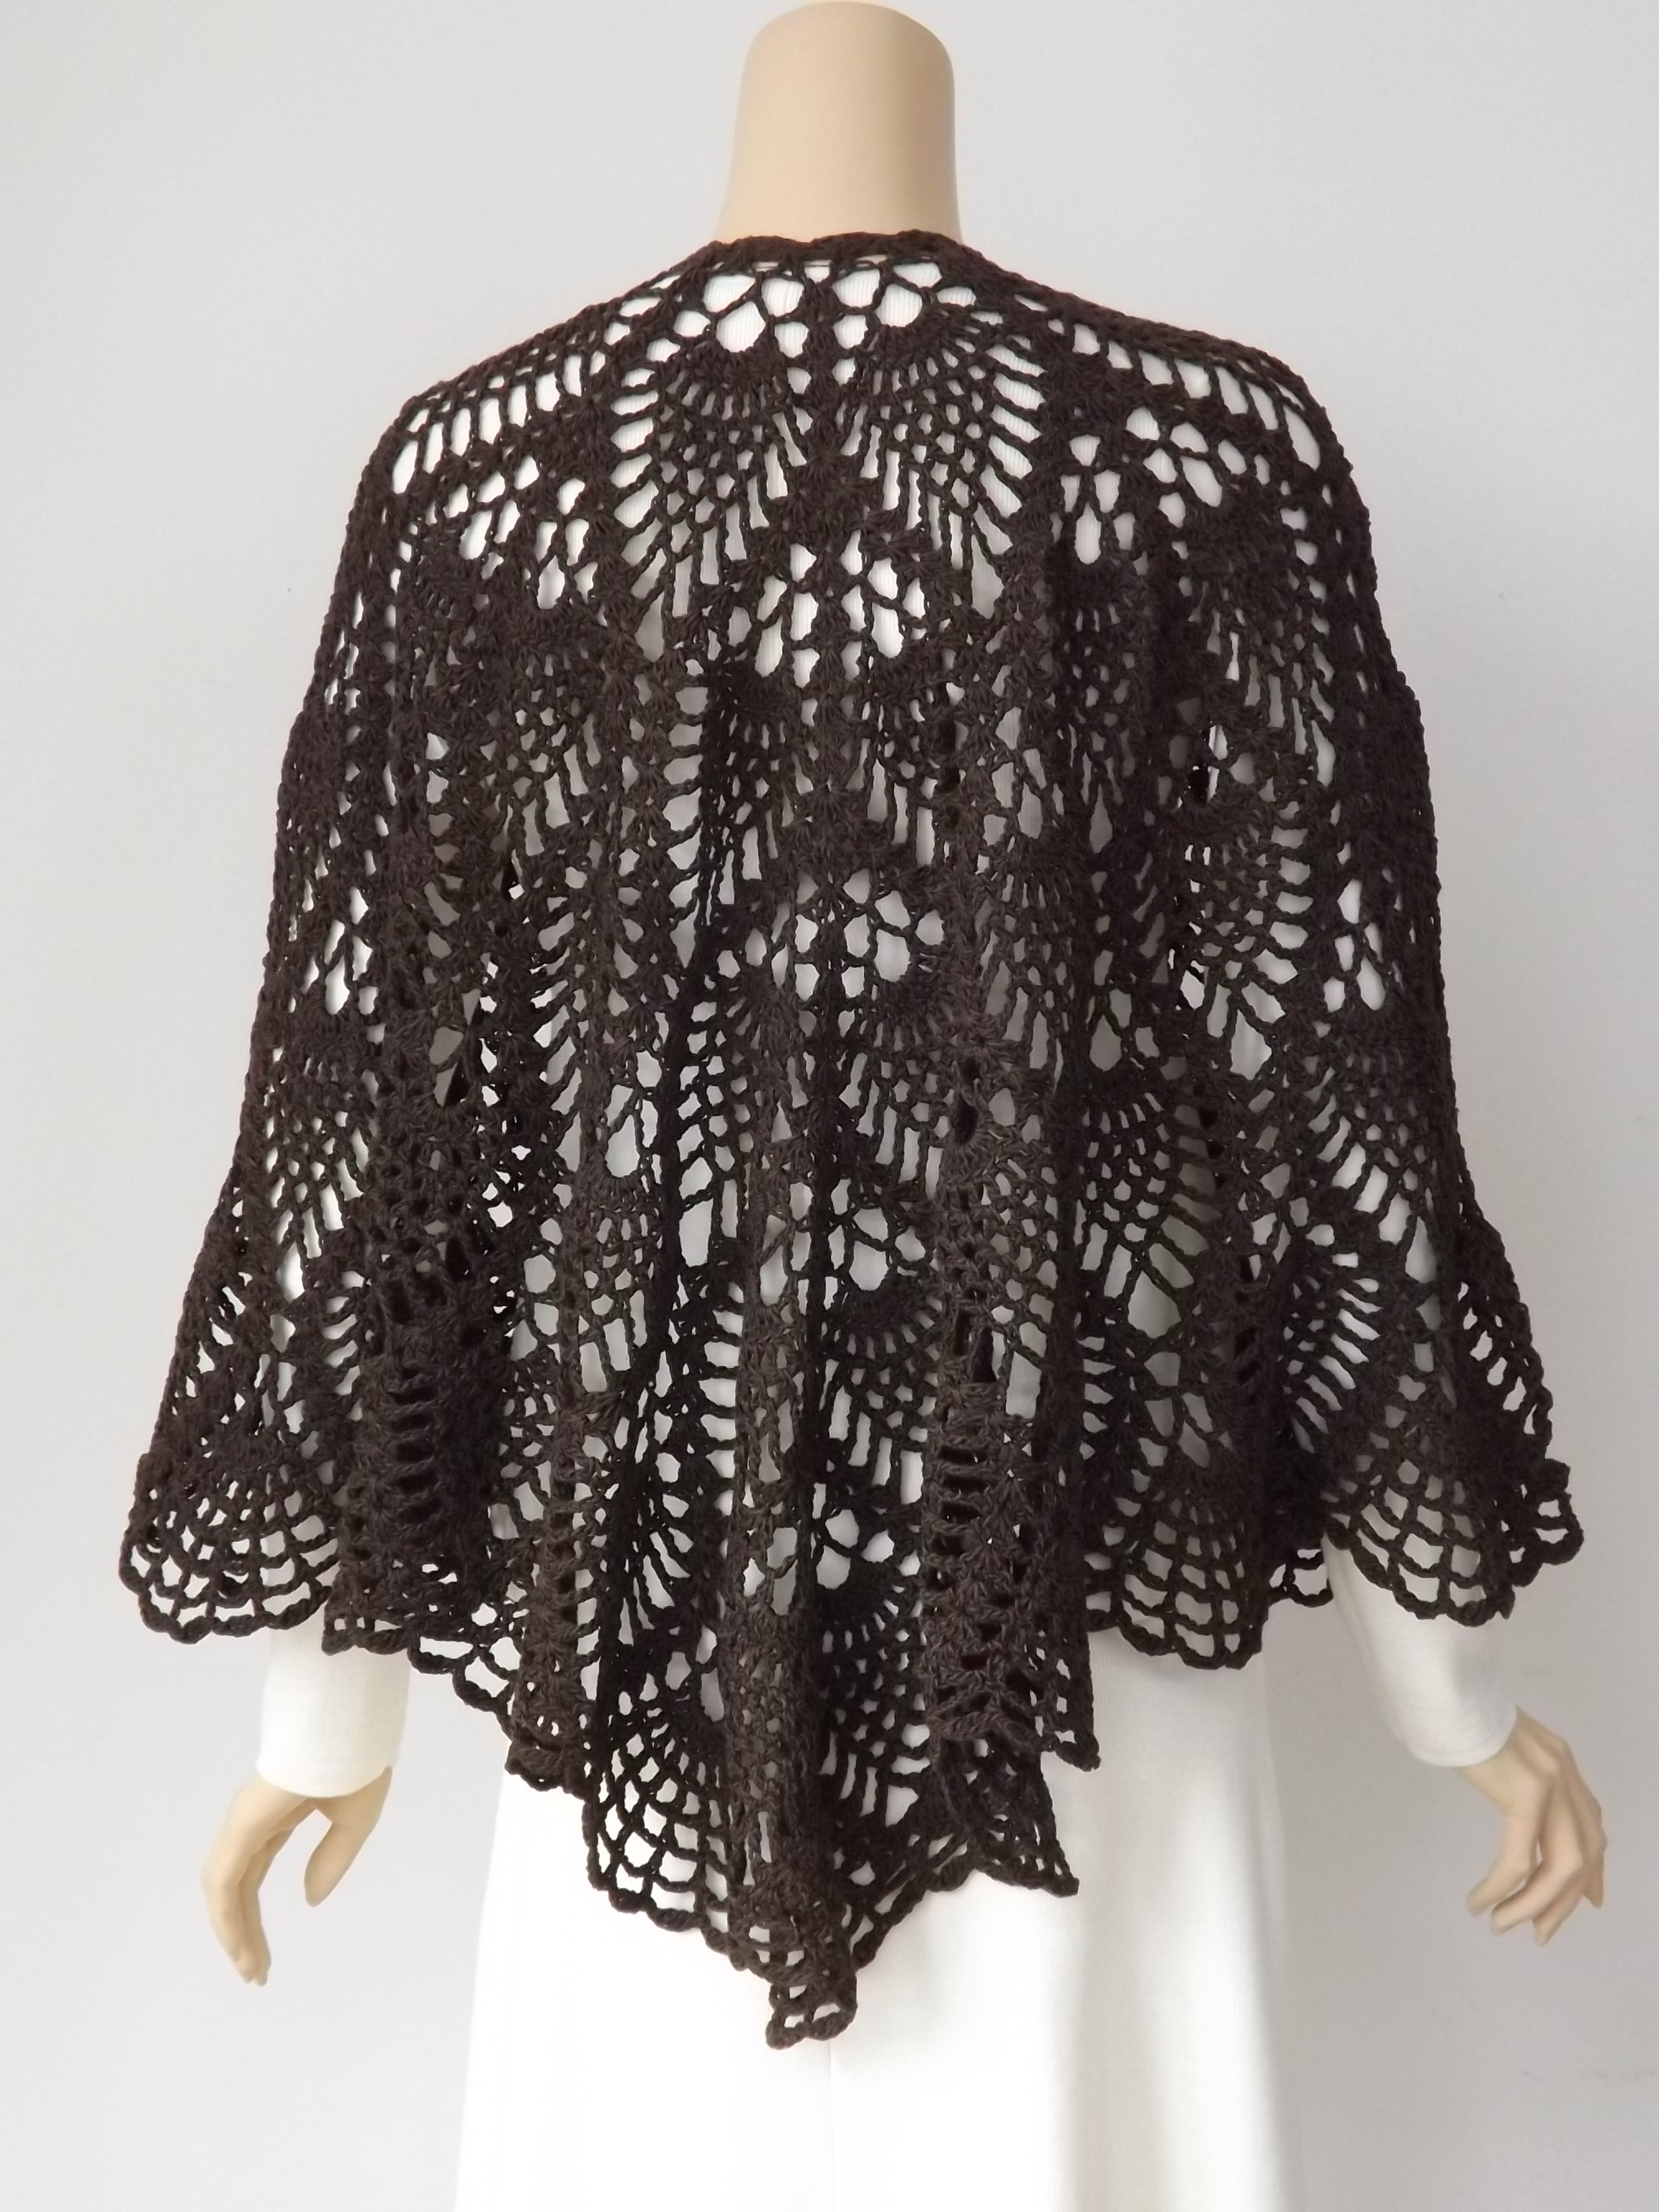 Doris Chan Crochet | Musings from Doris Chan, crochet designer ...